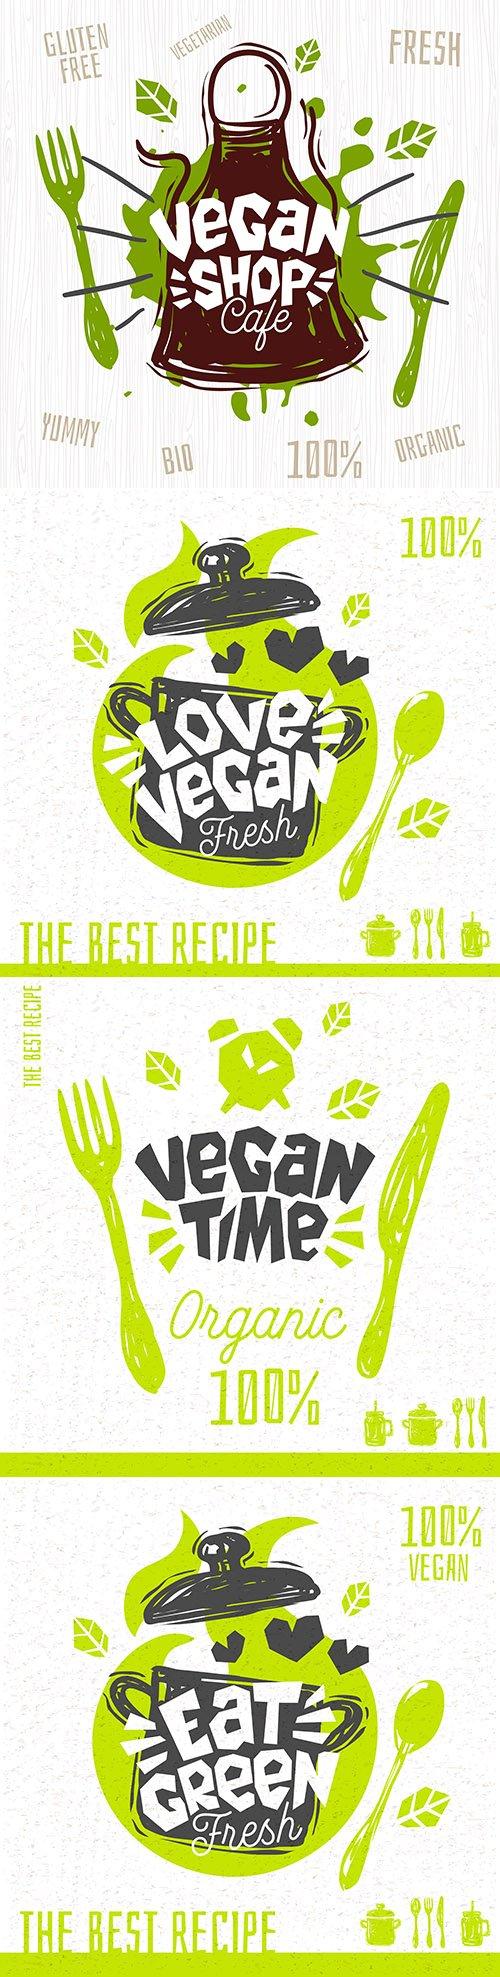 Vegan shop cafe logo fresh organic hand painted